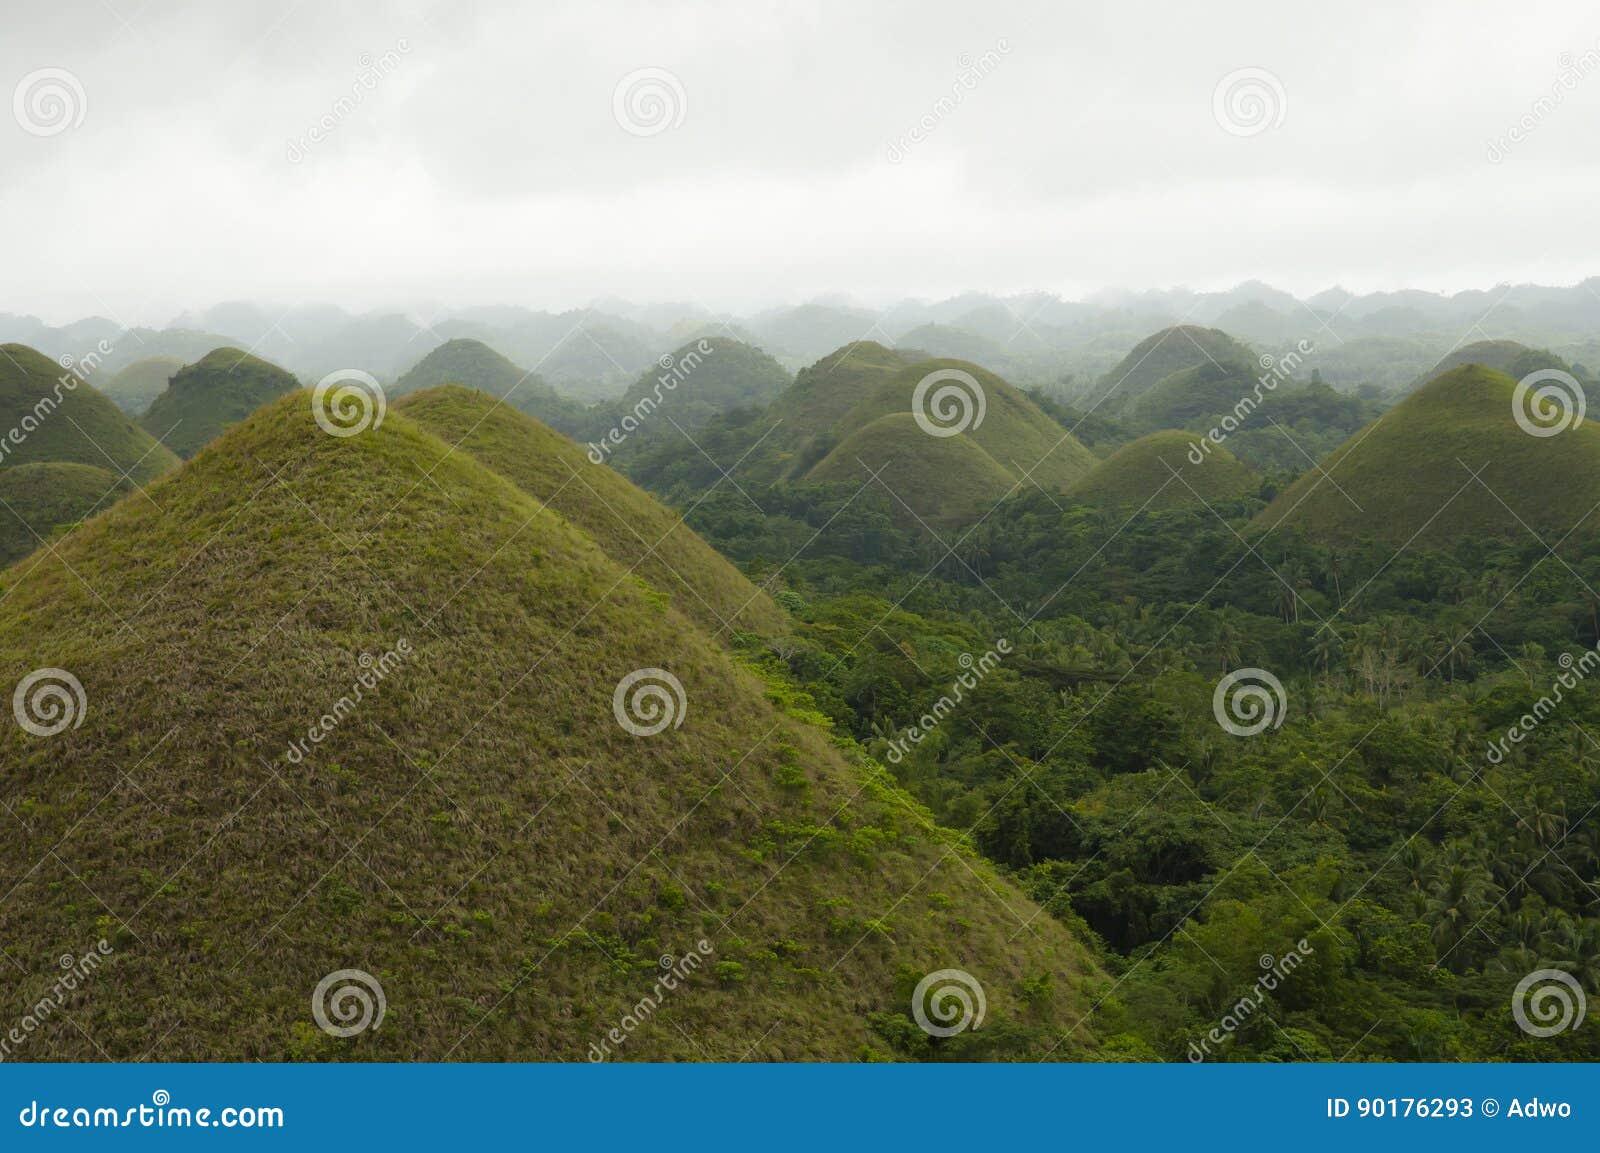 Schokoladen-Hügel - Bohol - Philippinen